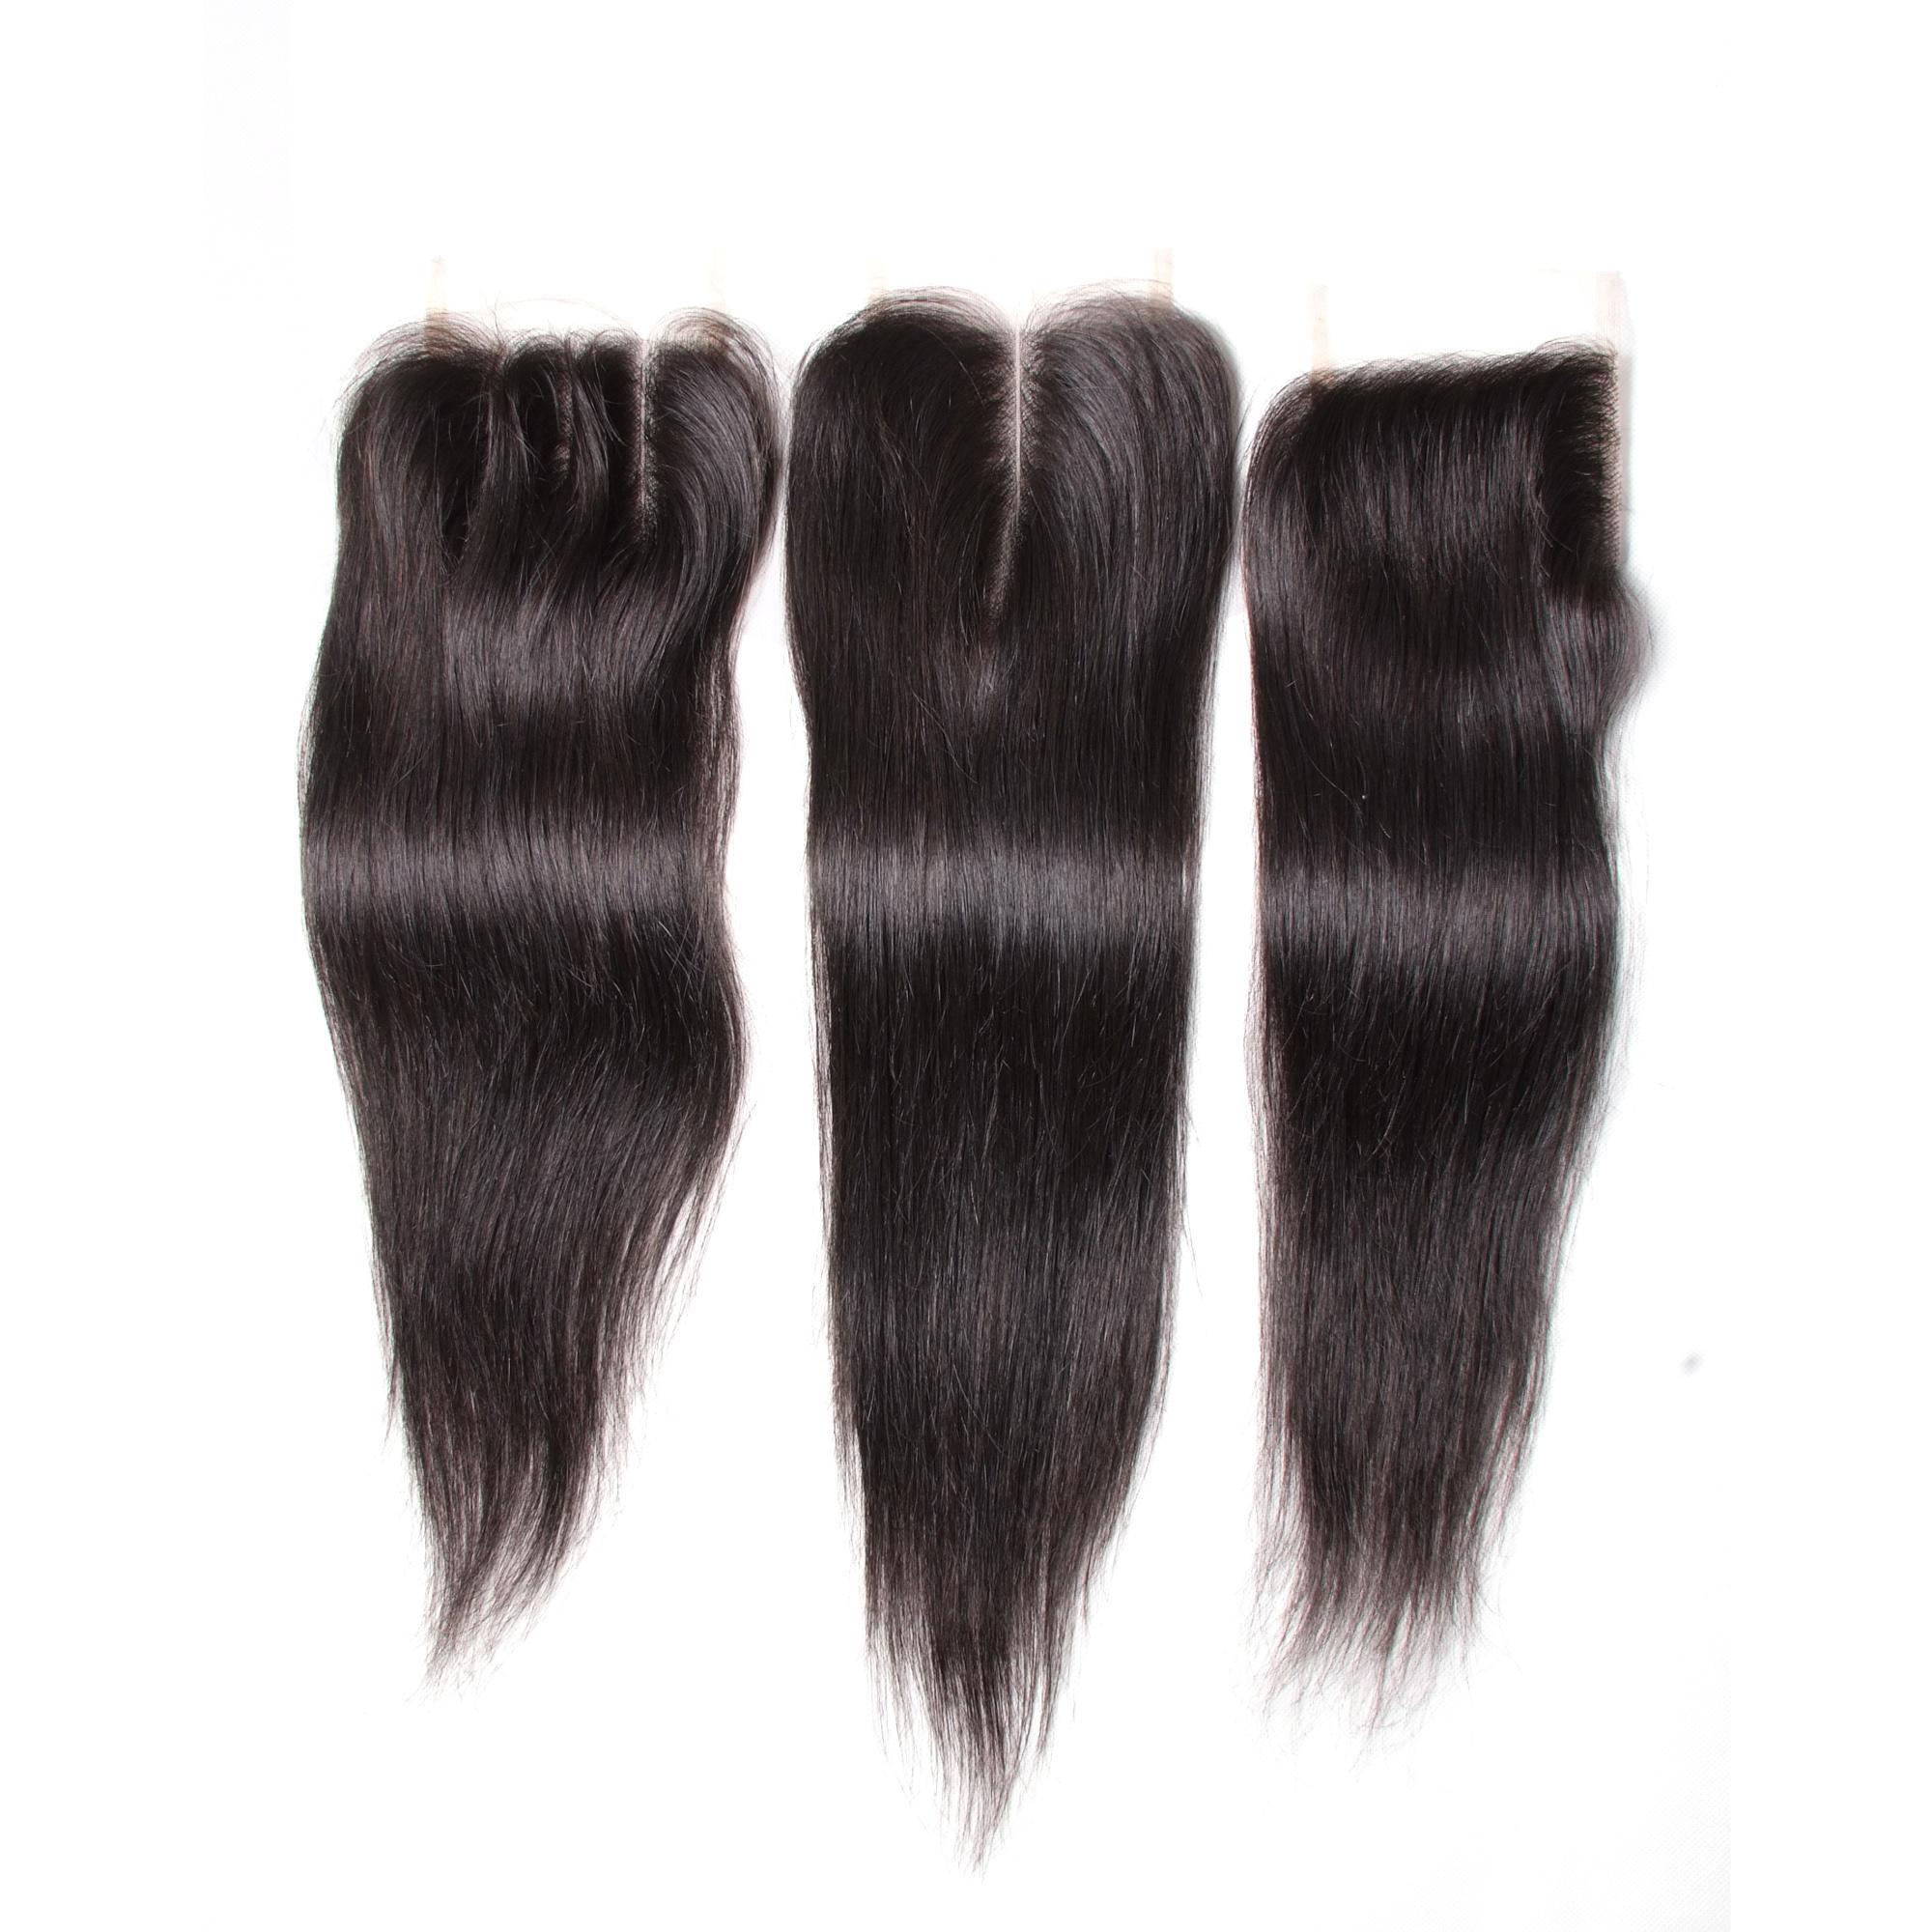 UNice Hair image 21